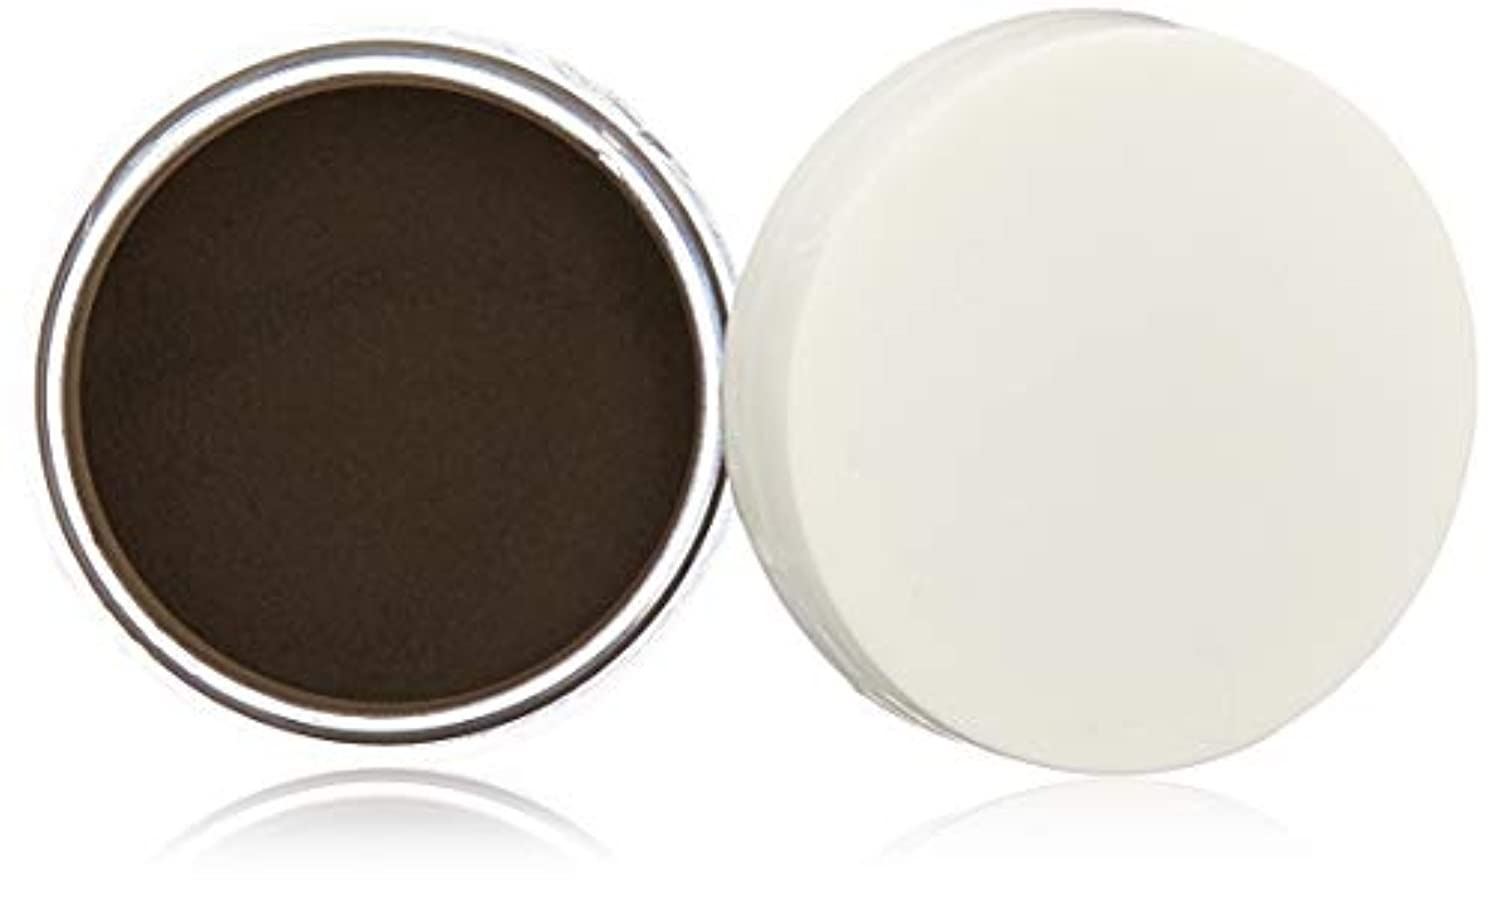 任意首相型Harmony Gelish - Acrylic Dip Powder - Black Shadow - 23g / 0.8oz